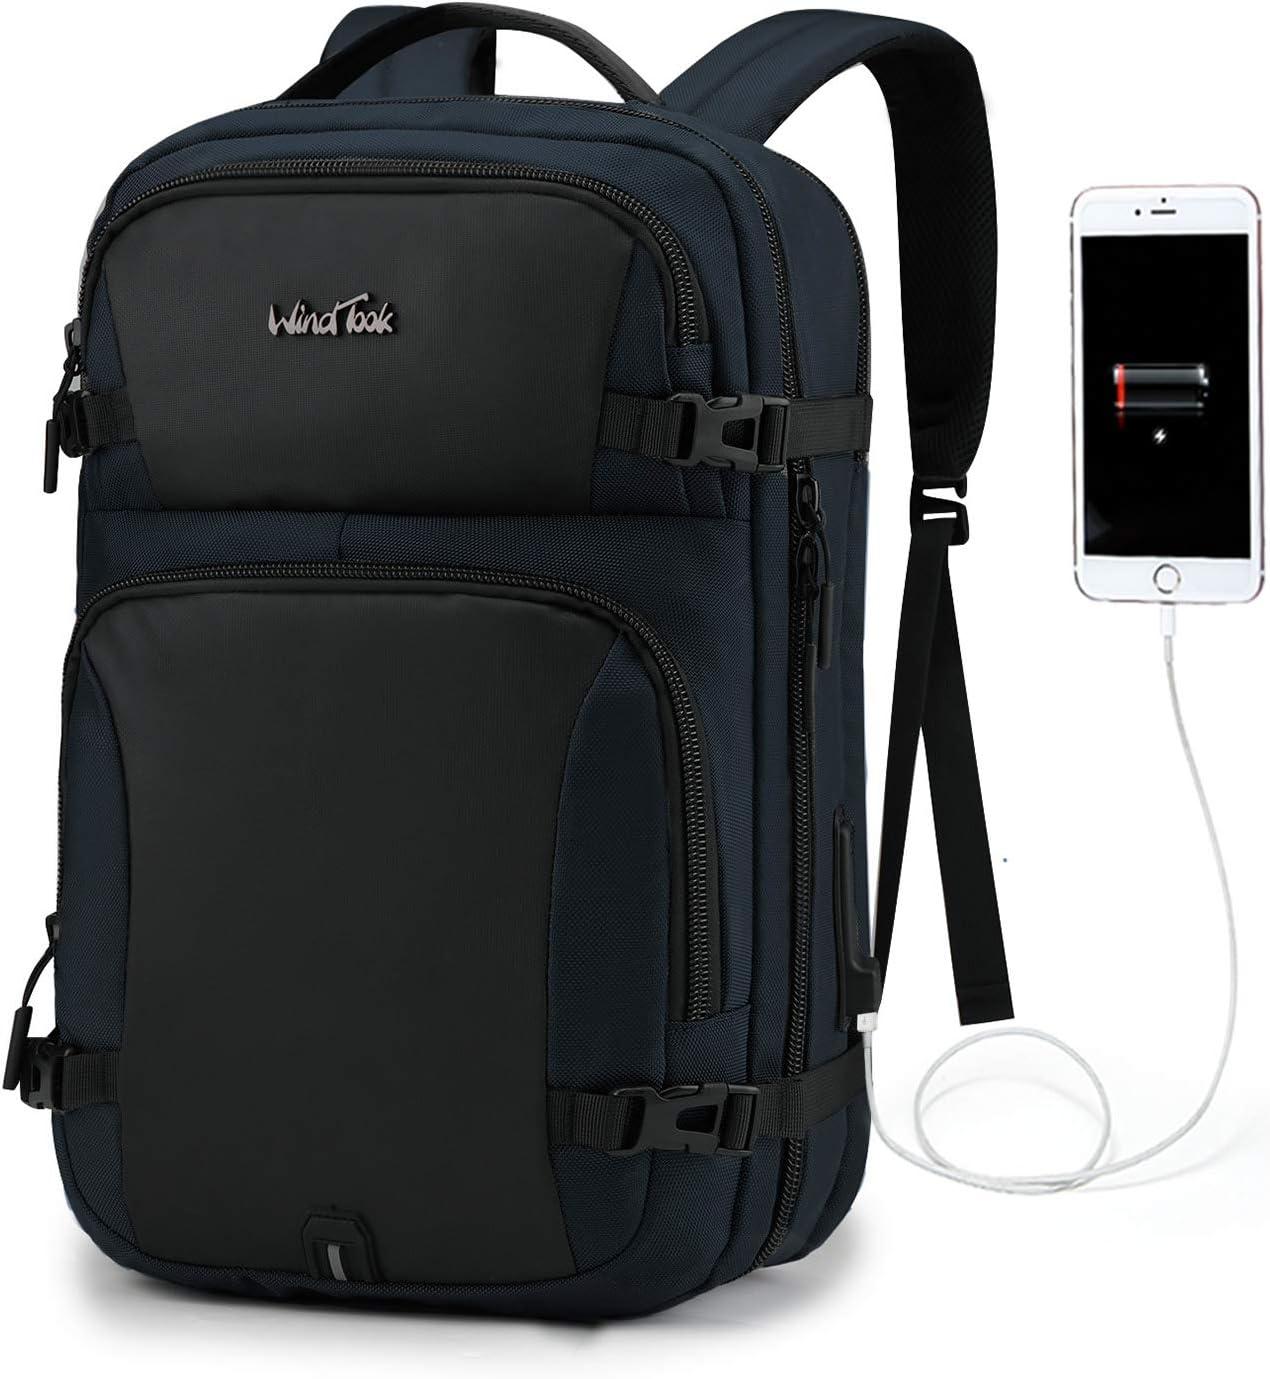 Wind Took Mochila de portátil con Puerto USB para 15.6 Pulgadas Multiusos Mochila Ordenador portátil Maletas de Cabina Impermeable para Trabajo Escuela viaja Mochila Unisex -Azul